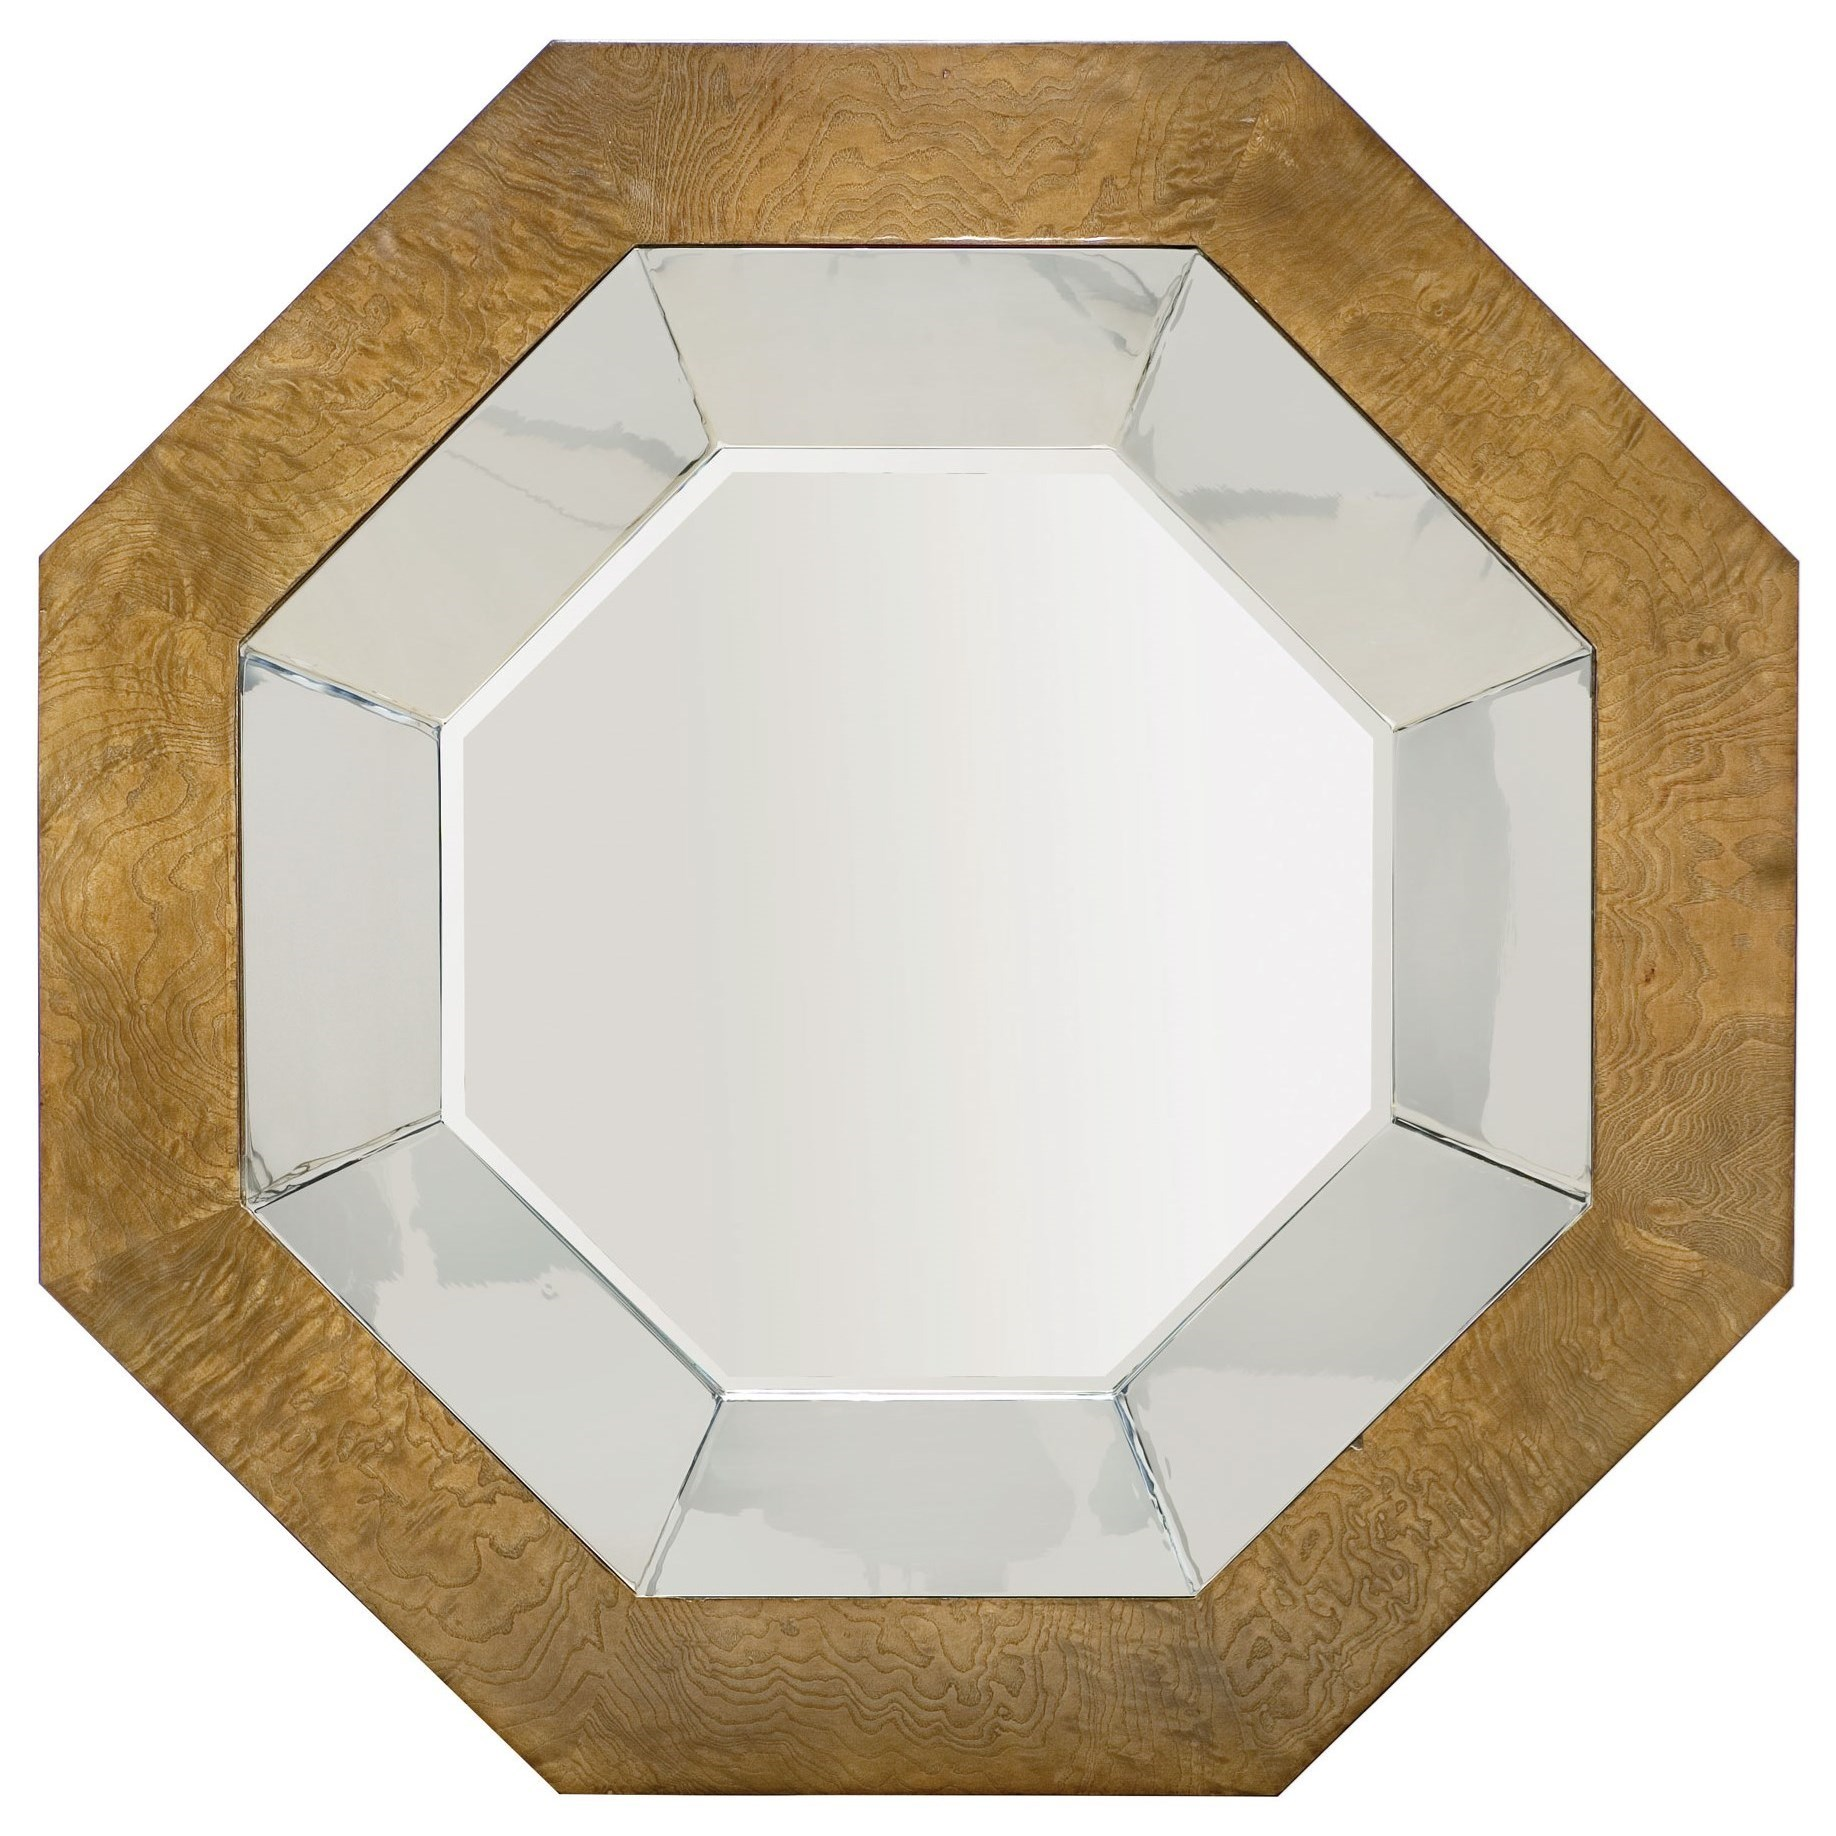 Soho Luxe Modern Octagonal Mirror at Williams & Kay